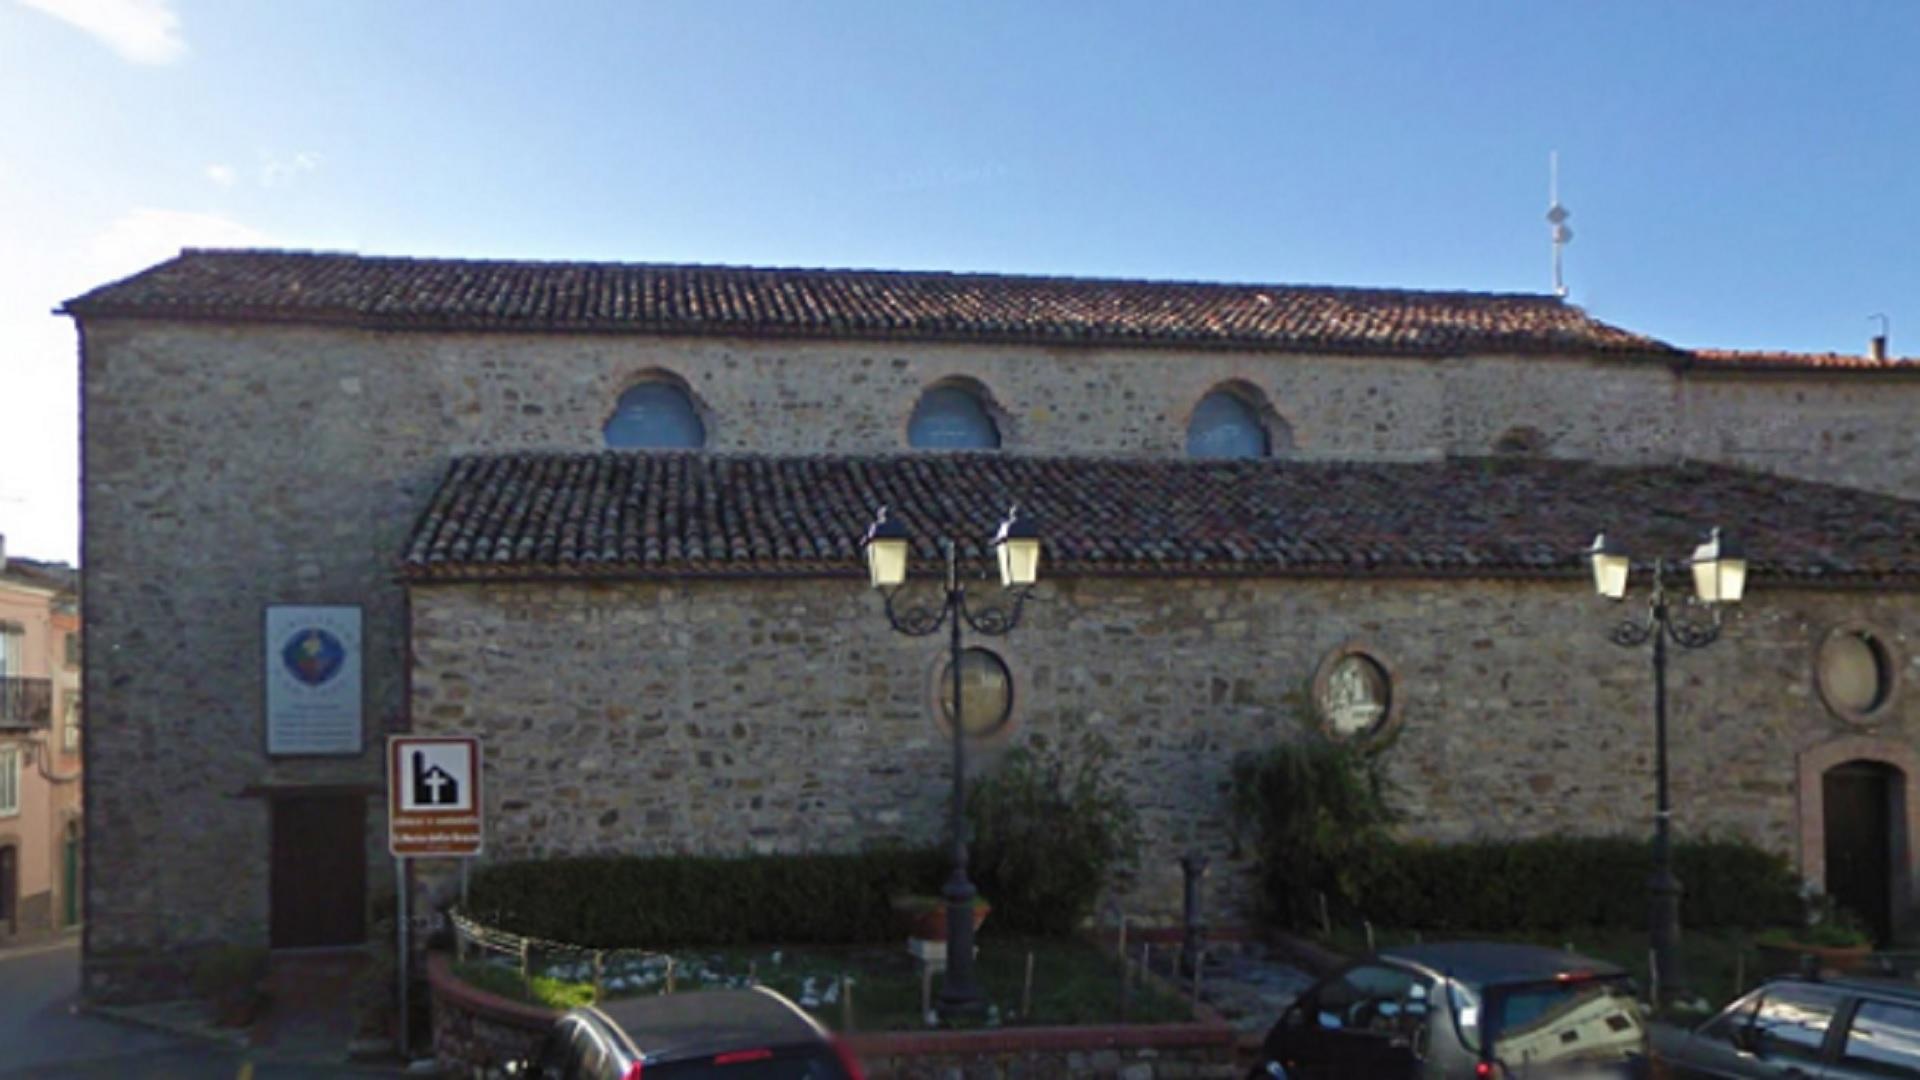 convento bellosguardo